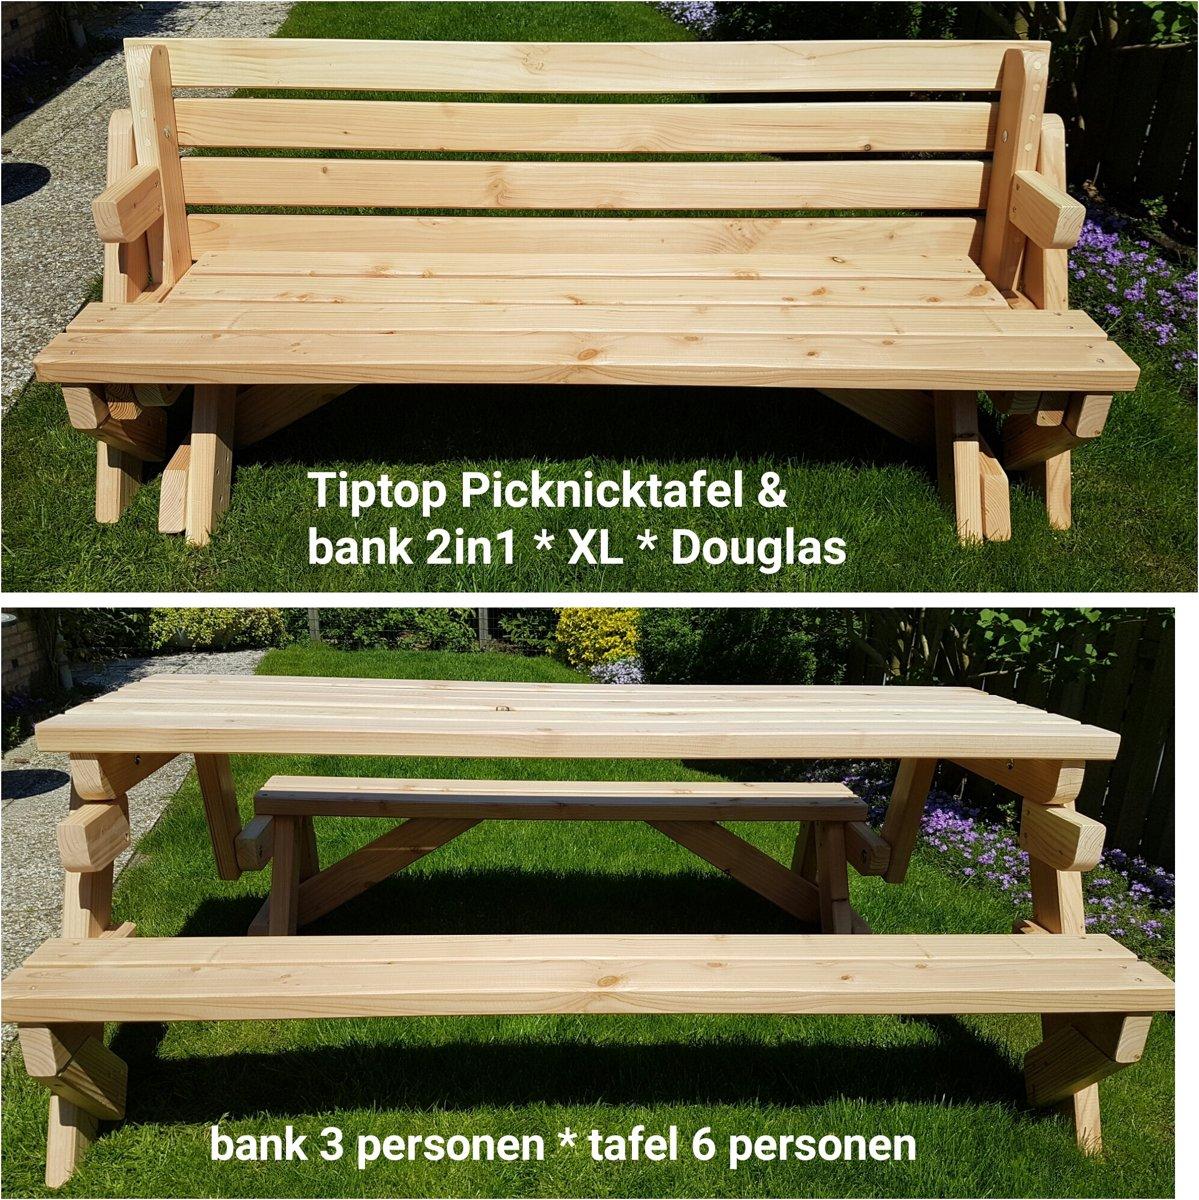 Picknicktafel Aanbieding Praxis.Bol Com Picknicktafel Kopen Alle Picknicktafels Online